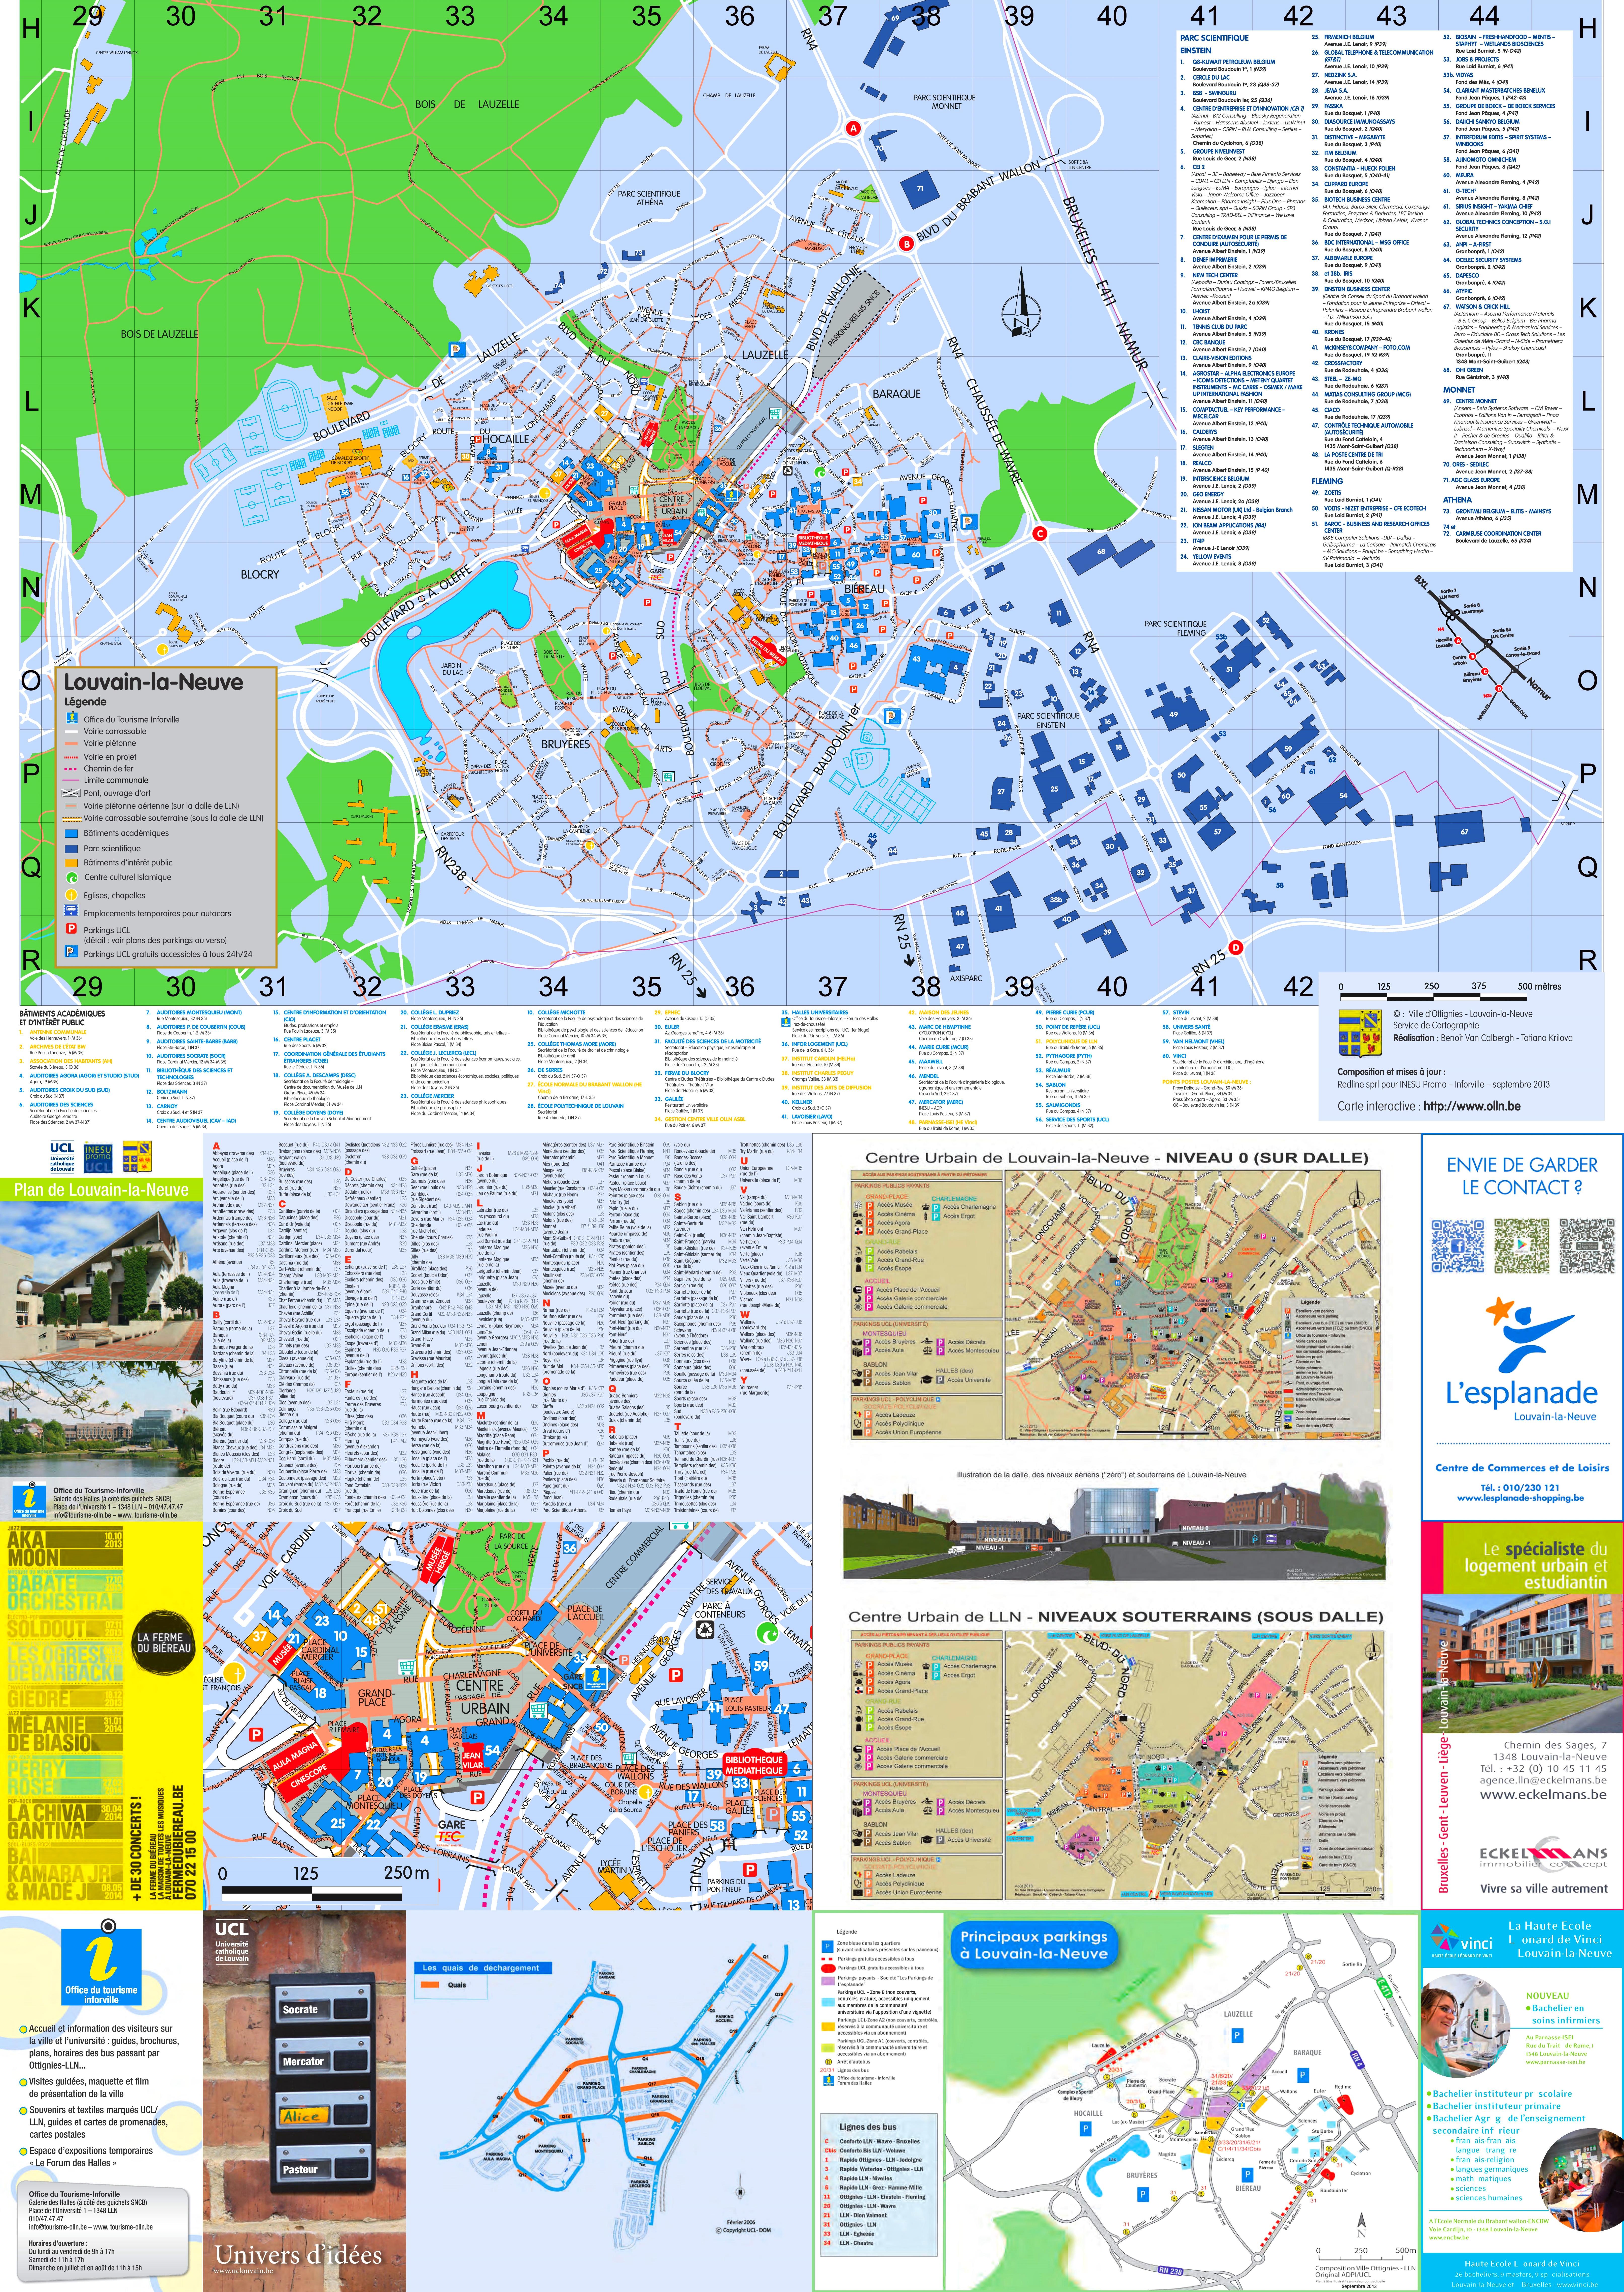 LouvainlaNeuve tourist map